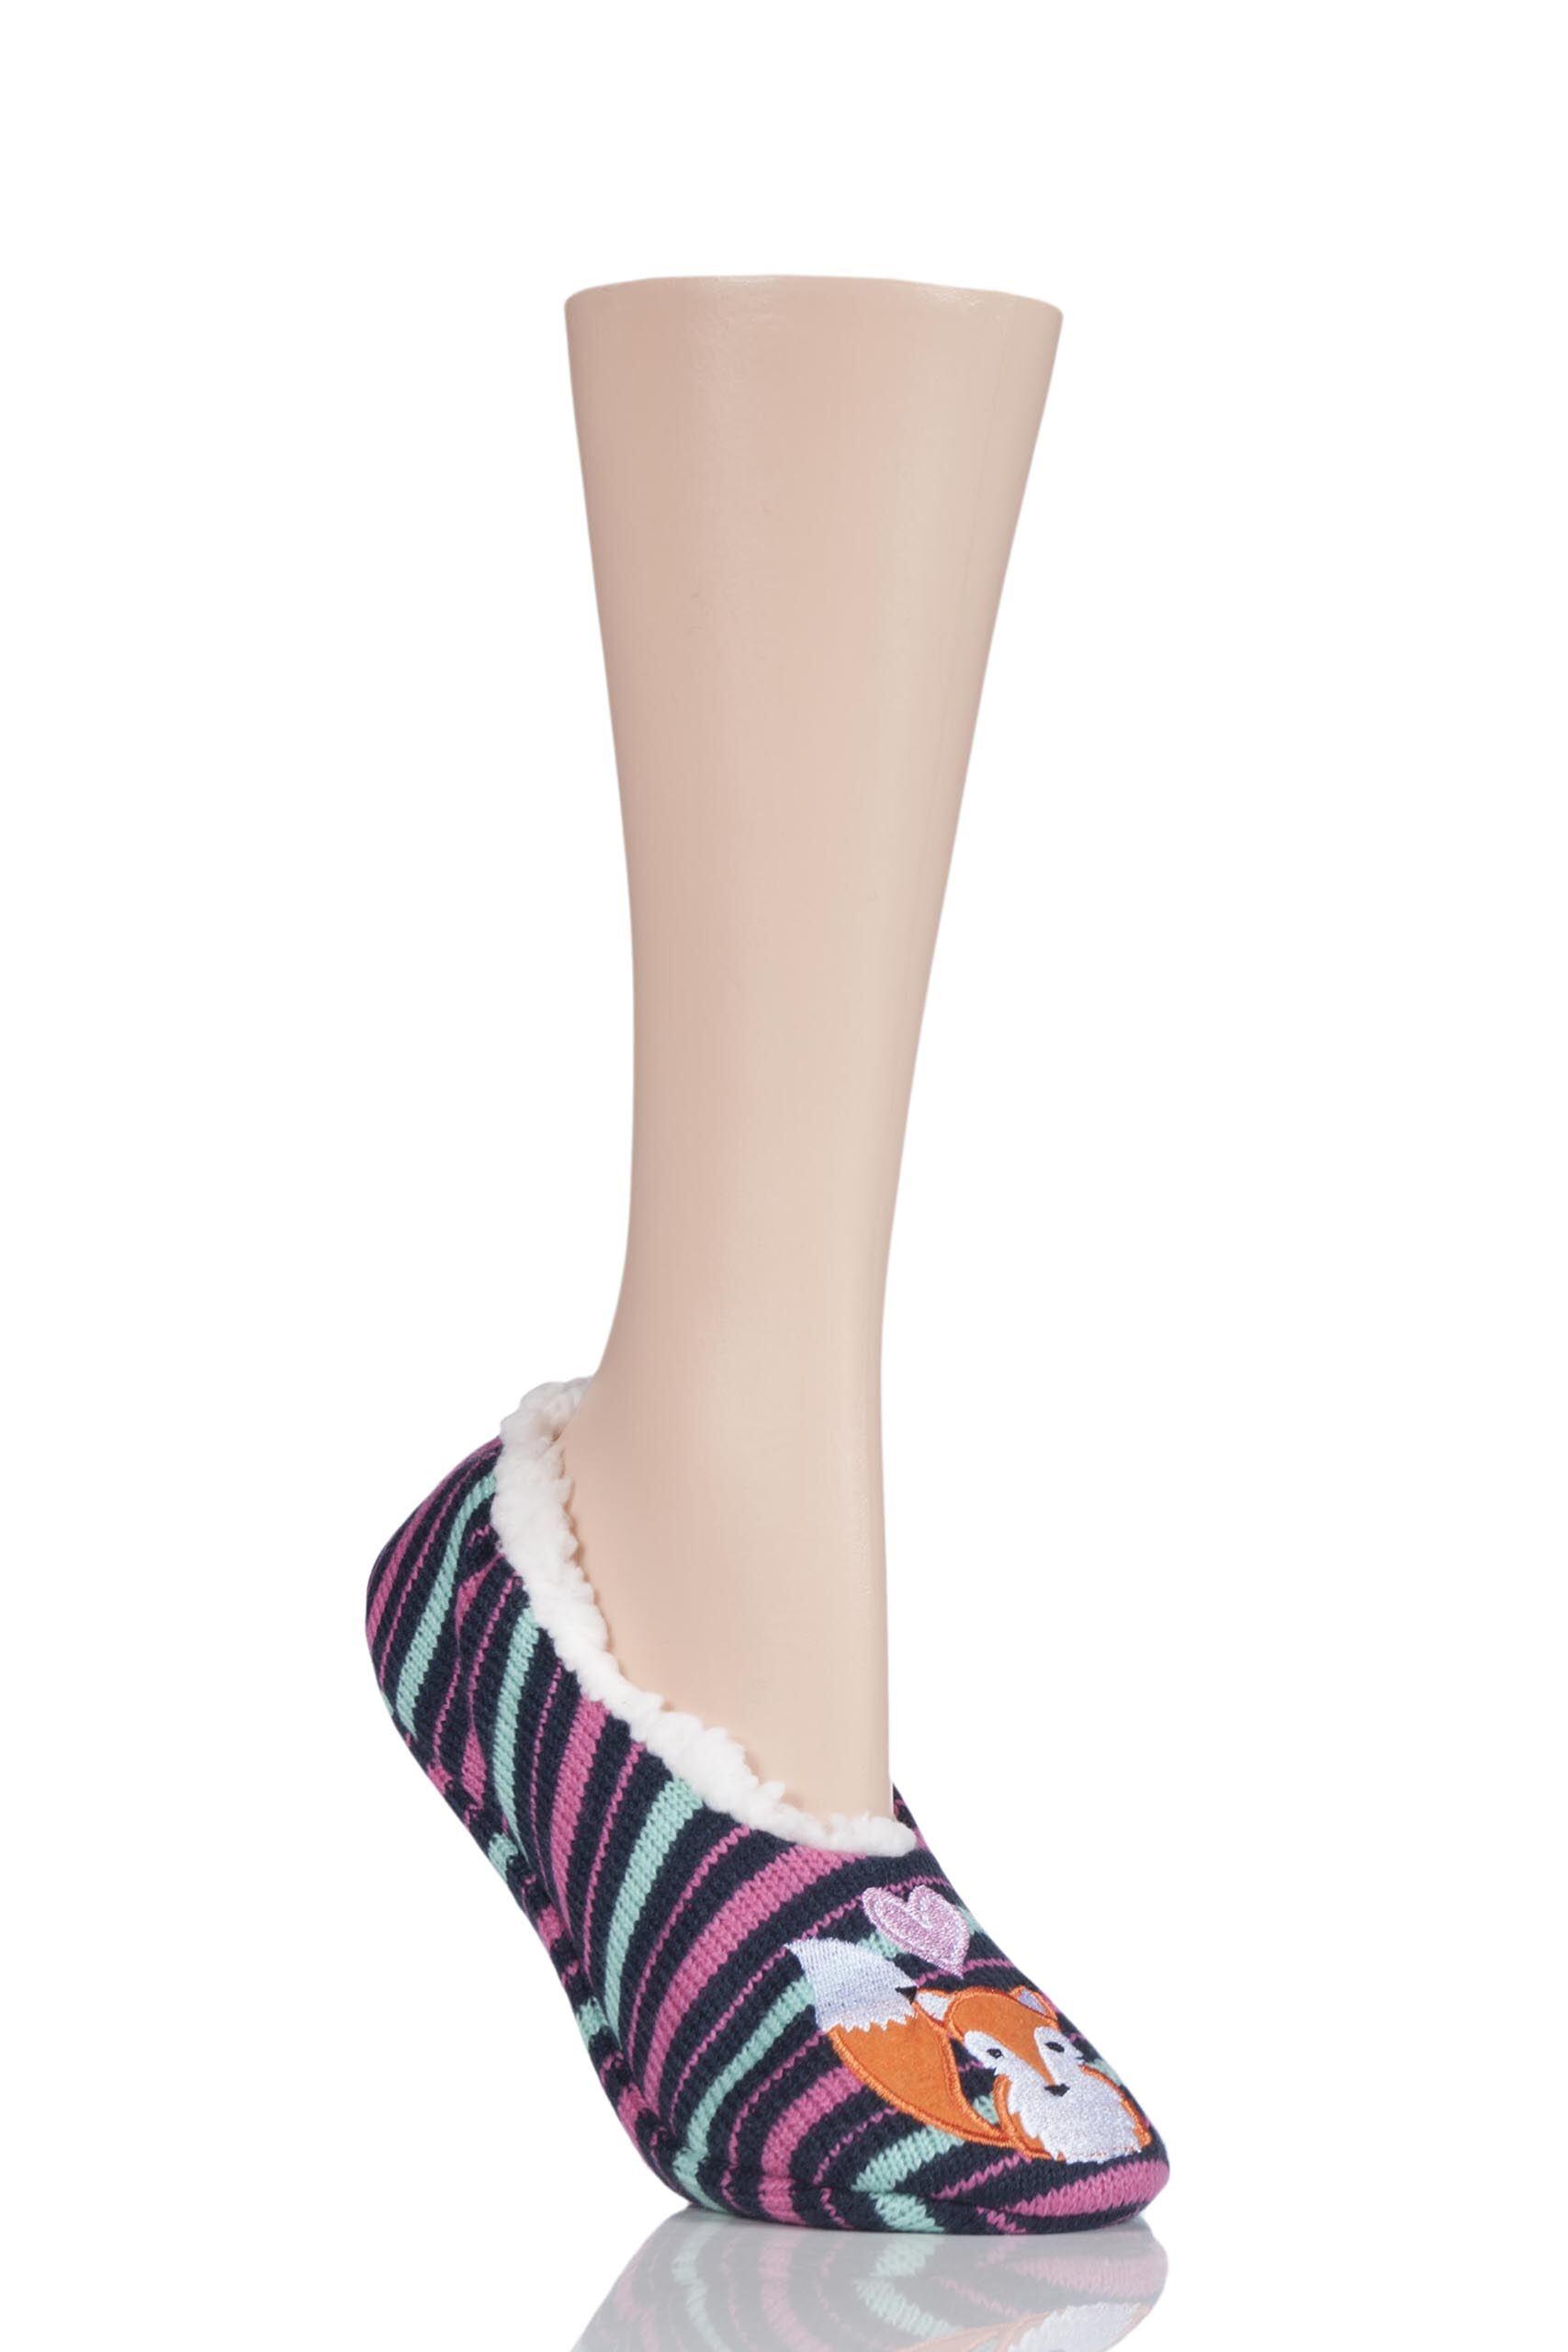 Image of 1 Pair Fox Fox Fleece Lined Knitted Slippers Ladies 4-8 Ladies - Wild Feet